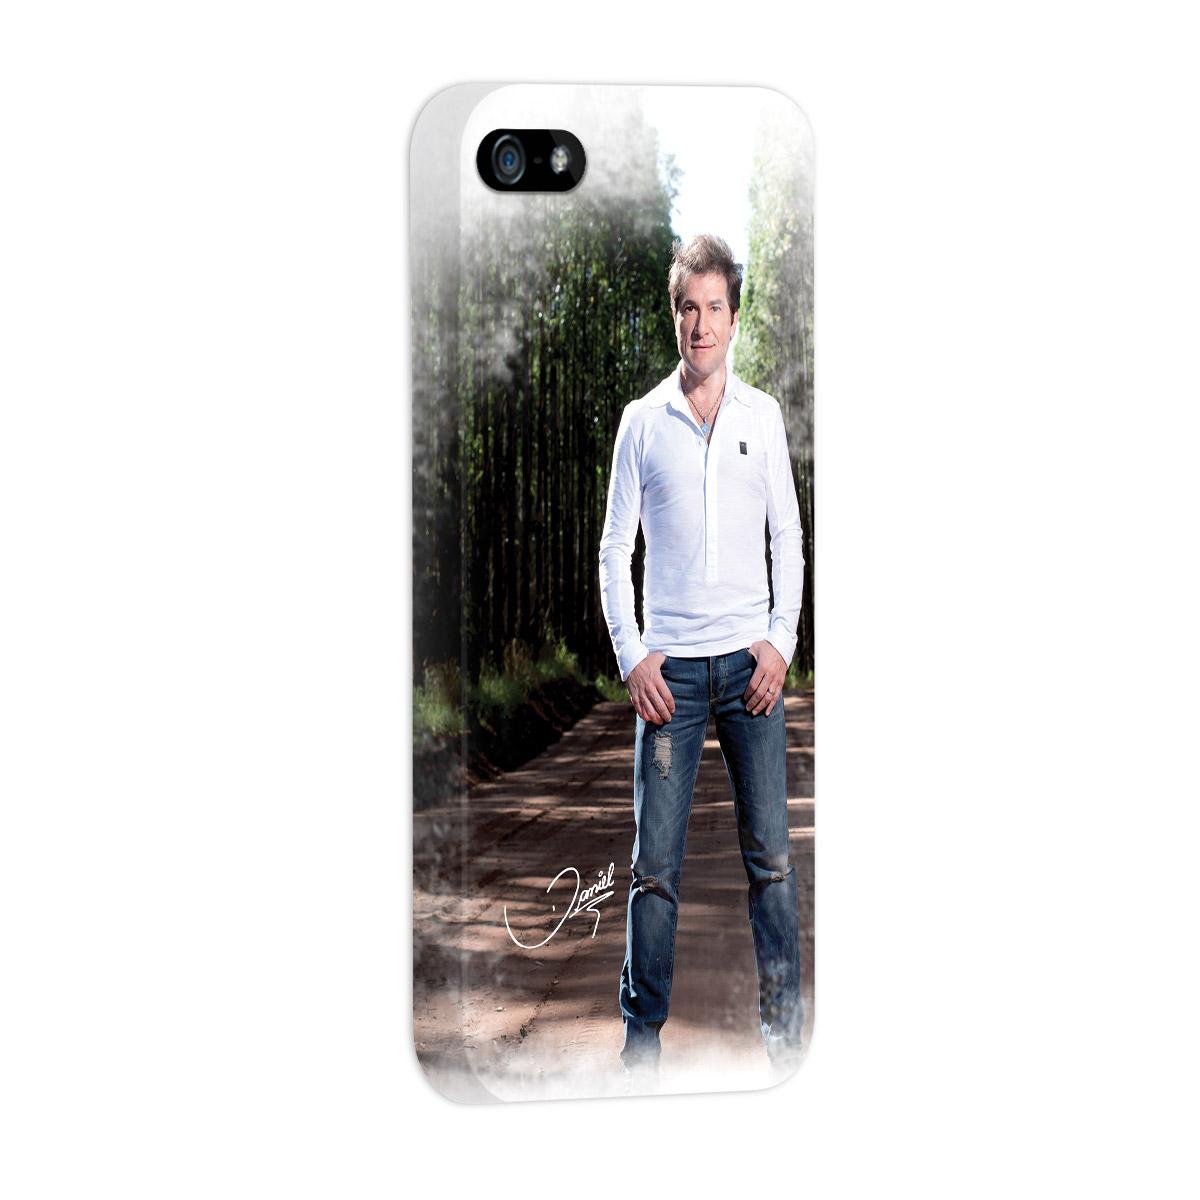 Capa de iPhone 5/5S Daniel Leva Meu Cora��o